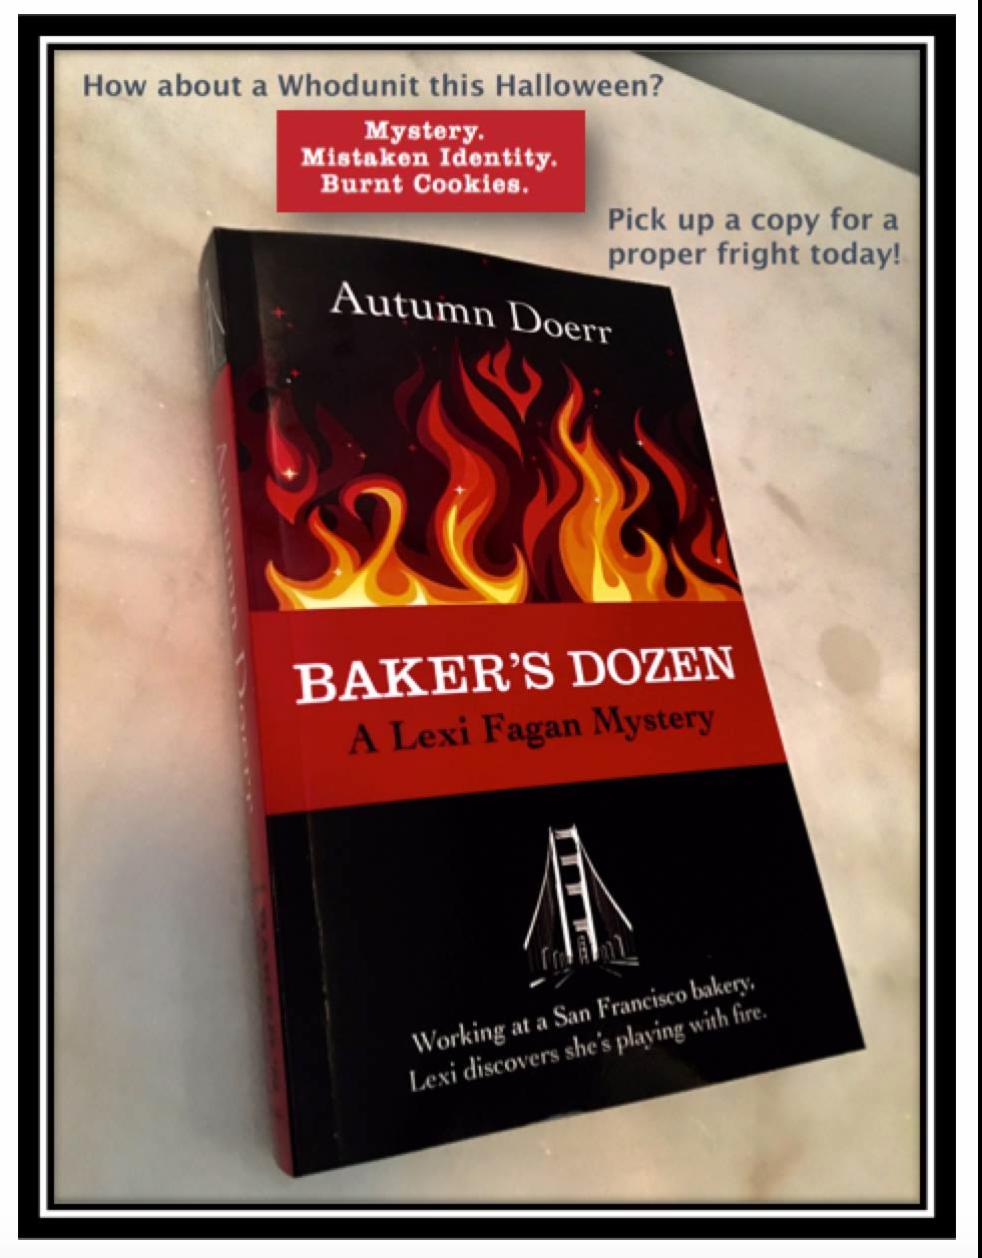 Mystery Book Baker's Dozen by Autumn Doerr